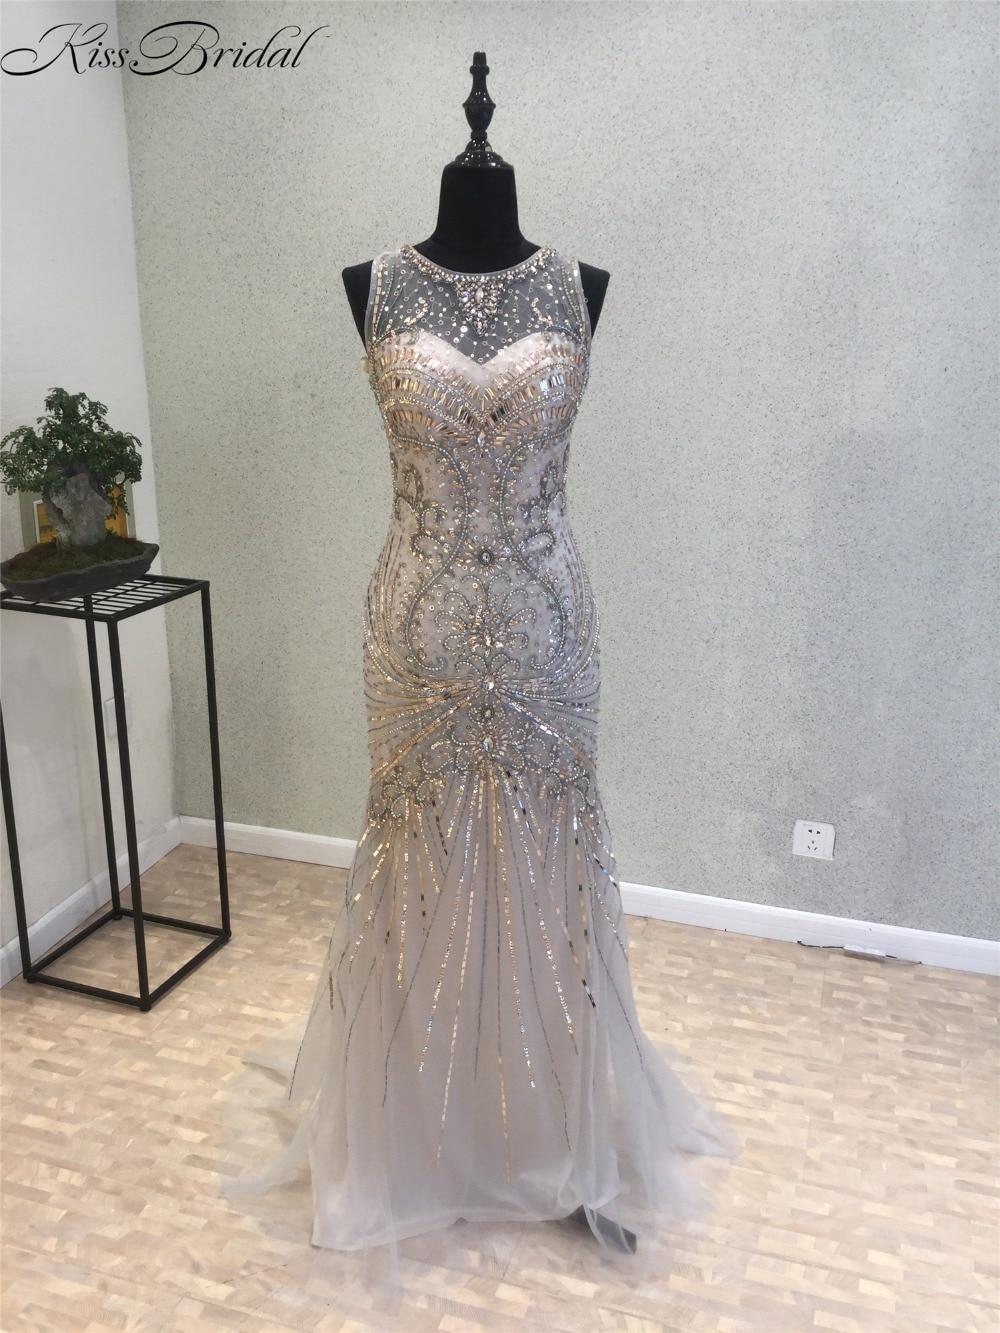 New Fashion Mermaid   Evening     Dress   2018 O-Neck Sleeveless Floor Length Sequins Beaded Tulle Prom   Dresses   Vestido longo de festa